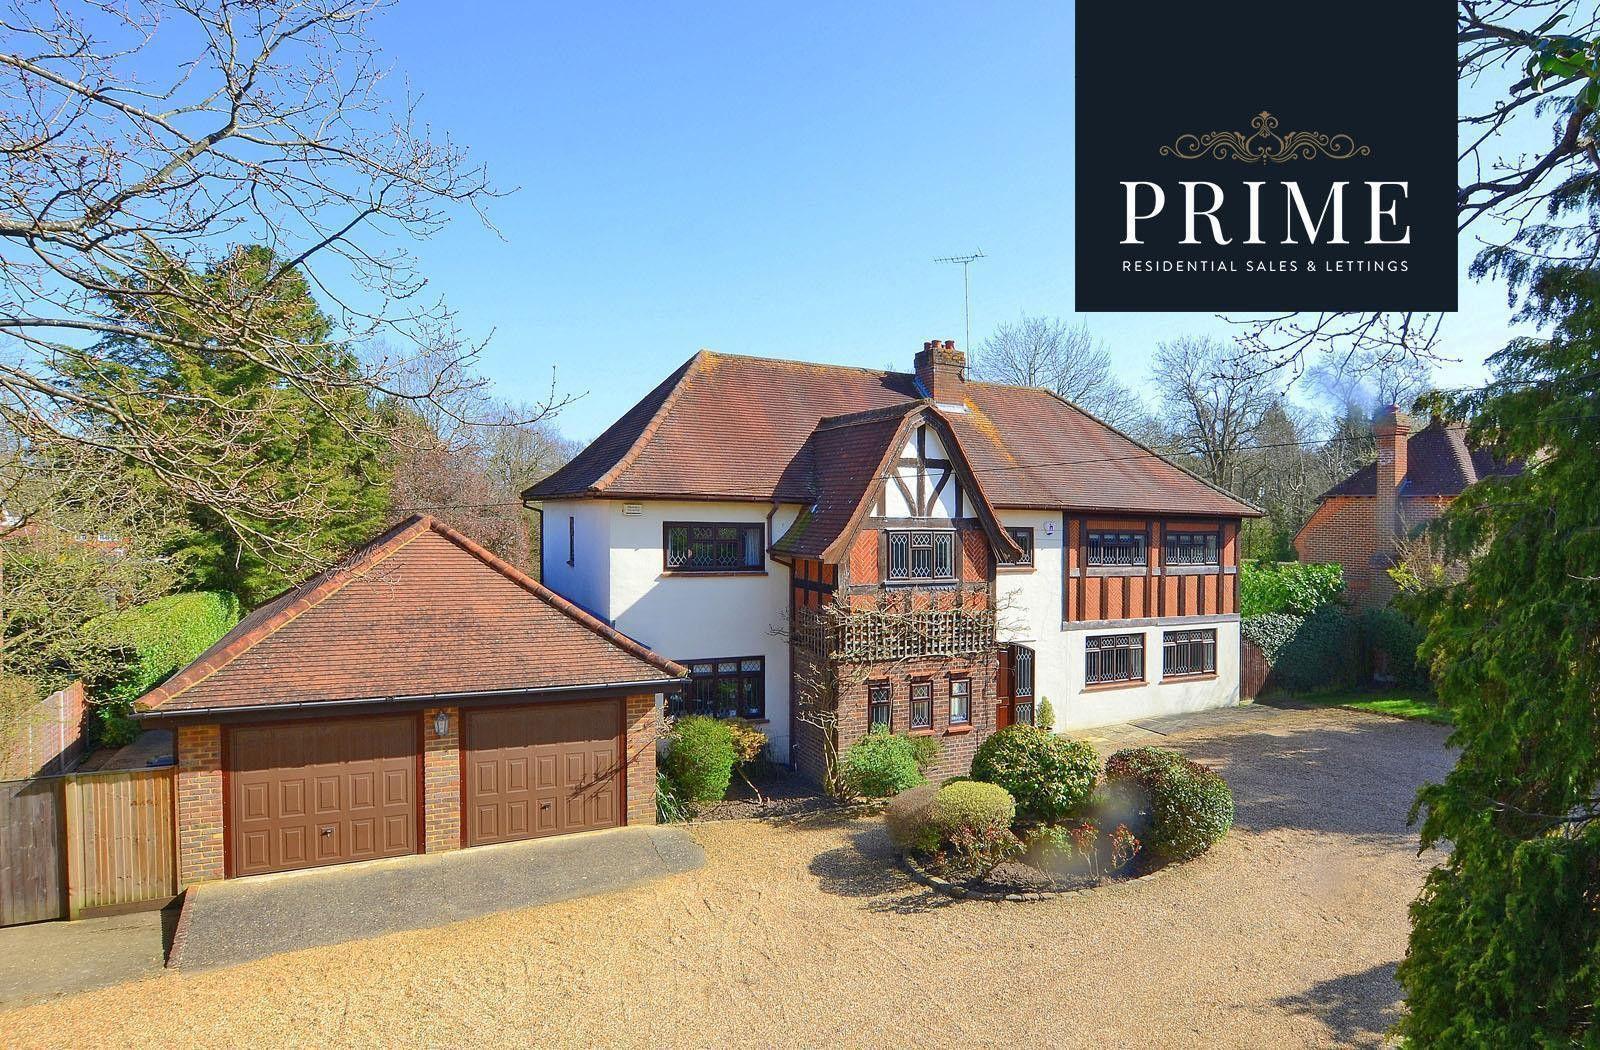 Property photo 1 of 17. Main Front Watermark (Main)